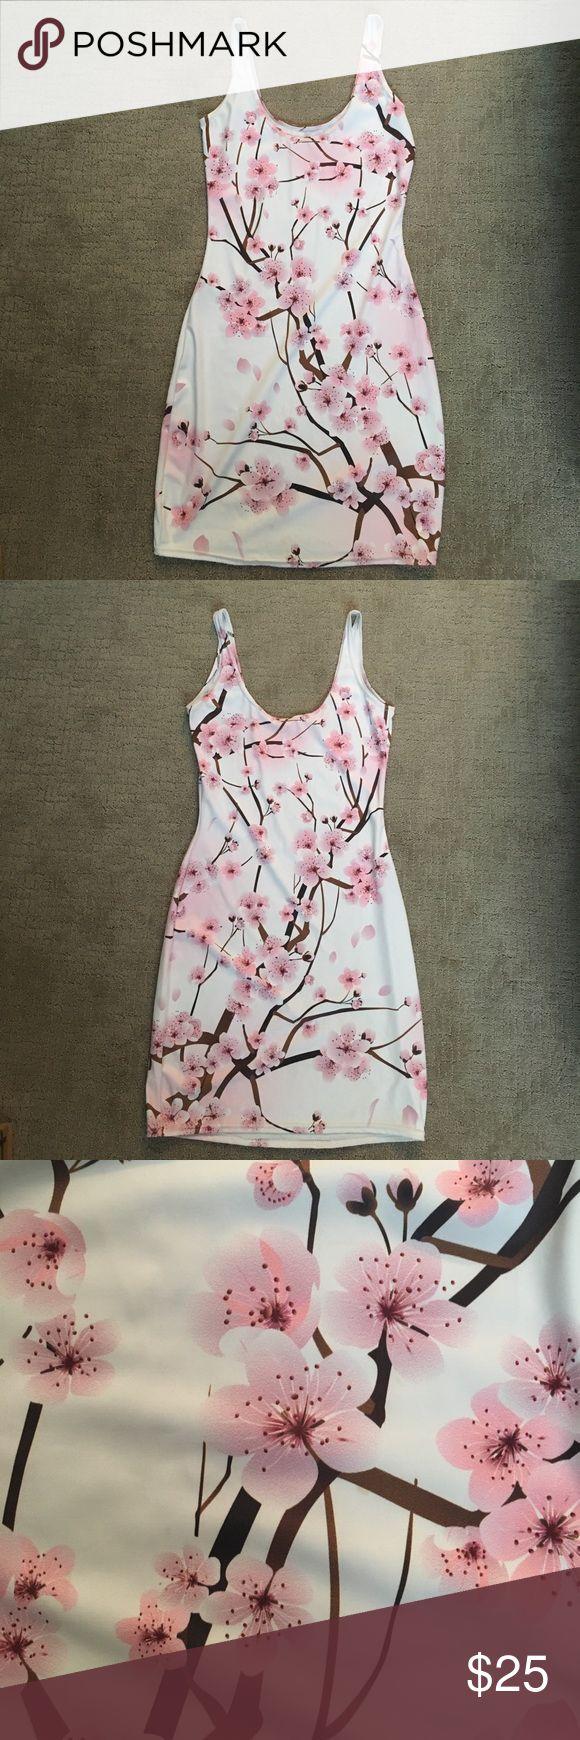 Blackmilk Clothing cherry blossom white dress Blackmilk Clothing cherry blossom white dress. Size S. Printed nylon. Blackmilk Dresses Mini